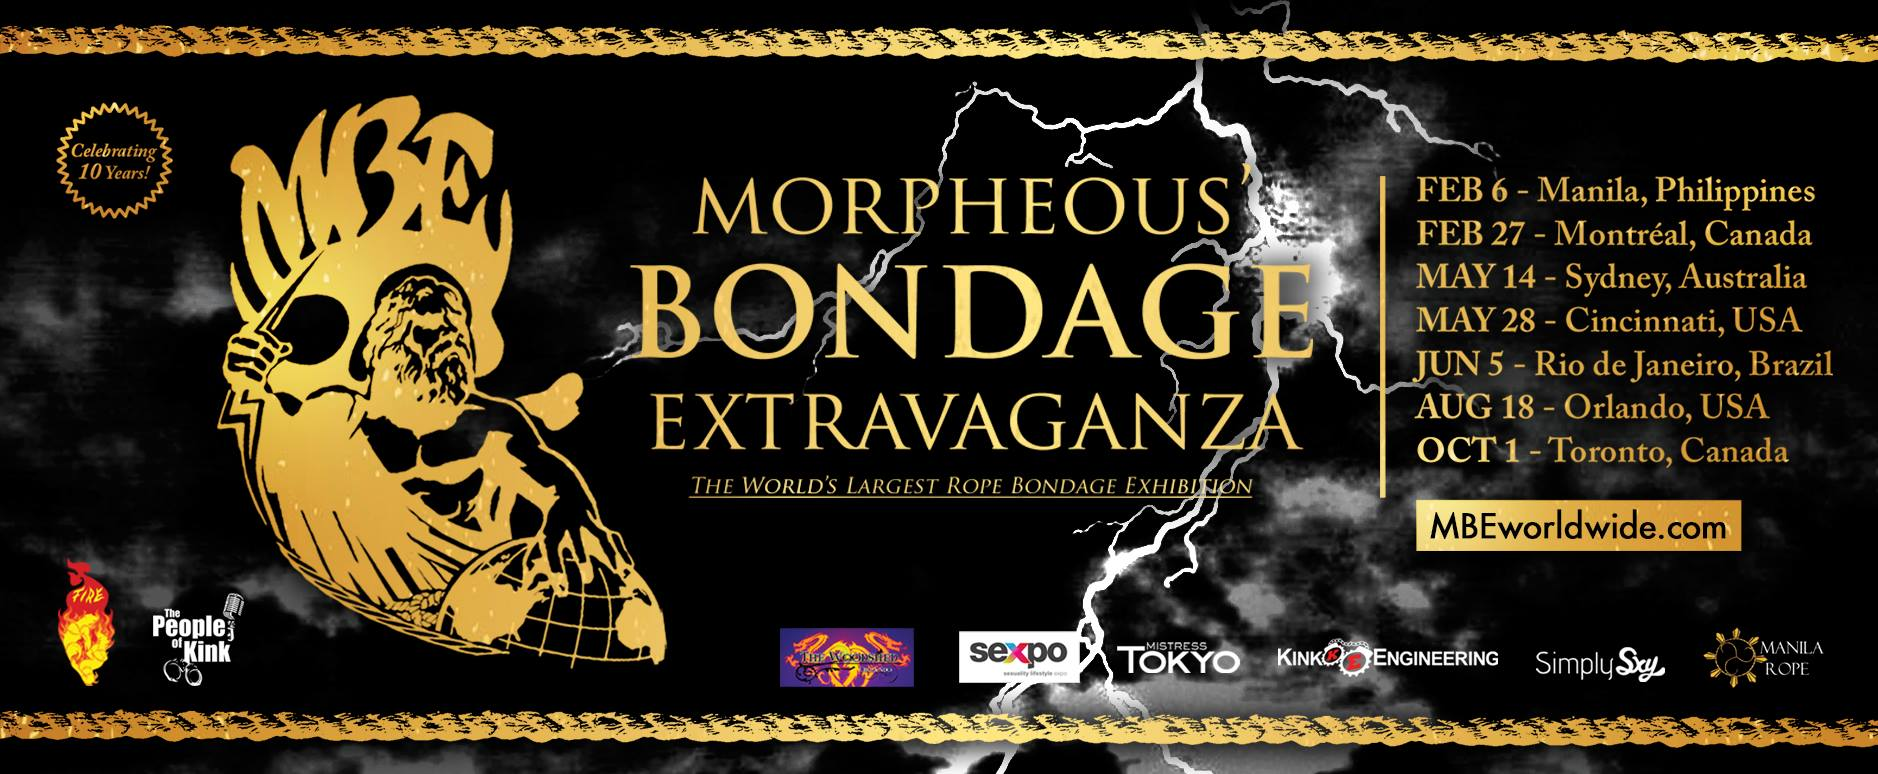 Morpheus-Bondage-Extravaganza-10th-year-MBE